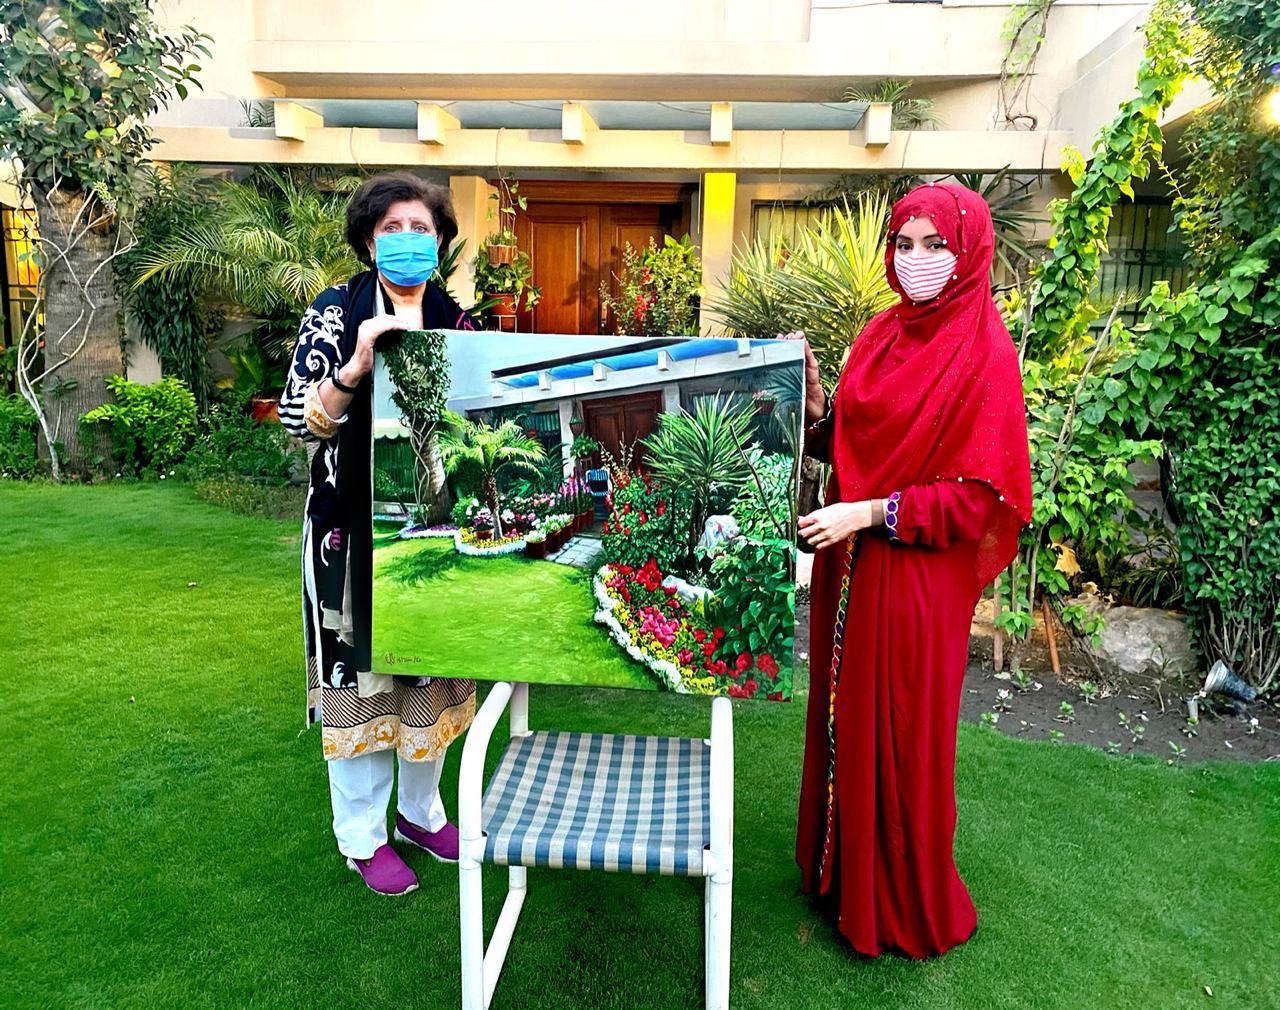 GardenPainting